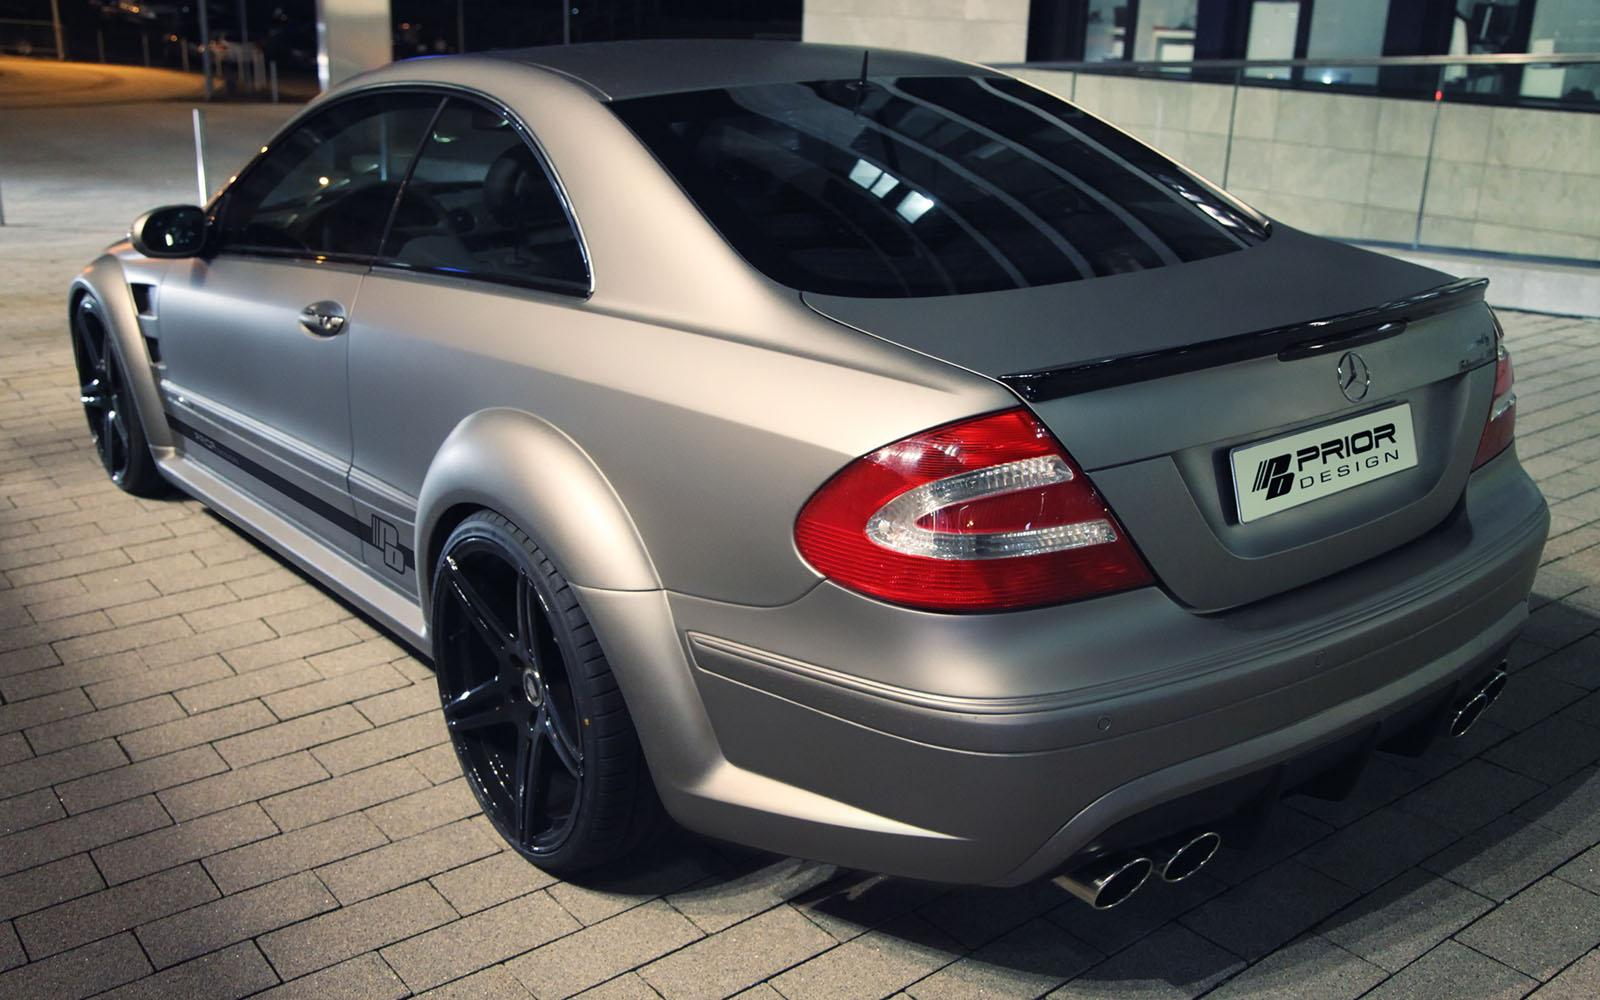 Mercedes benz clk black series kit by prior design 9 for Mercedes benz clk body kit